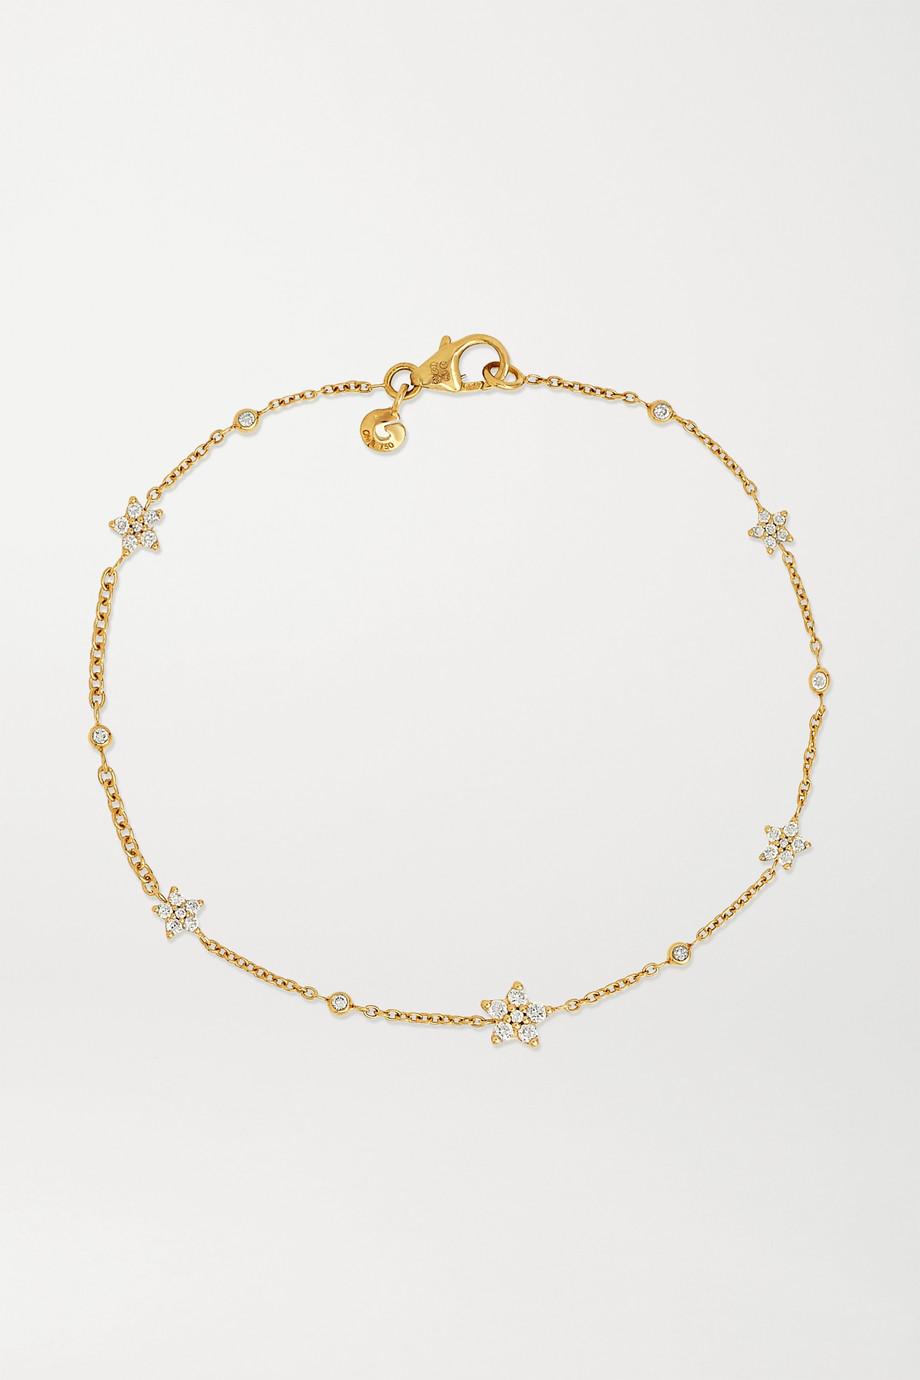 OLE LYNGGAARD COPENHAGEN Shooting Stars 18-karat gold diamond bracelet